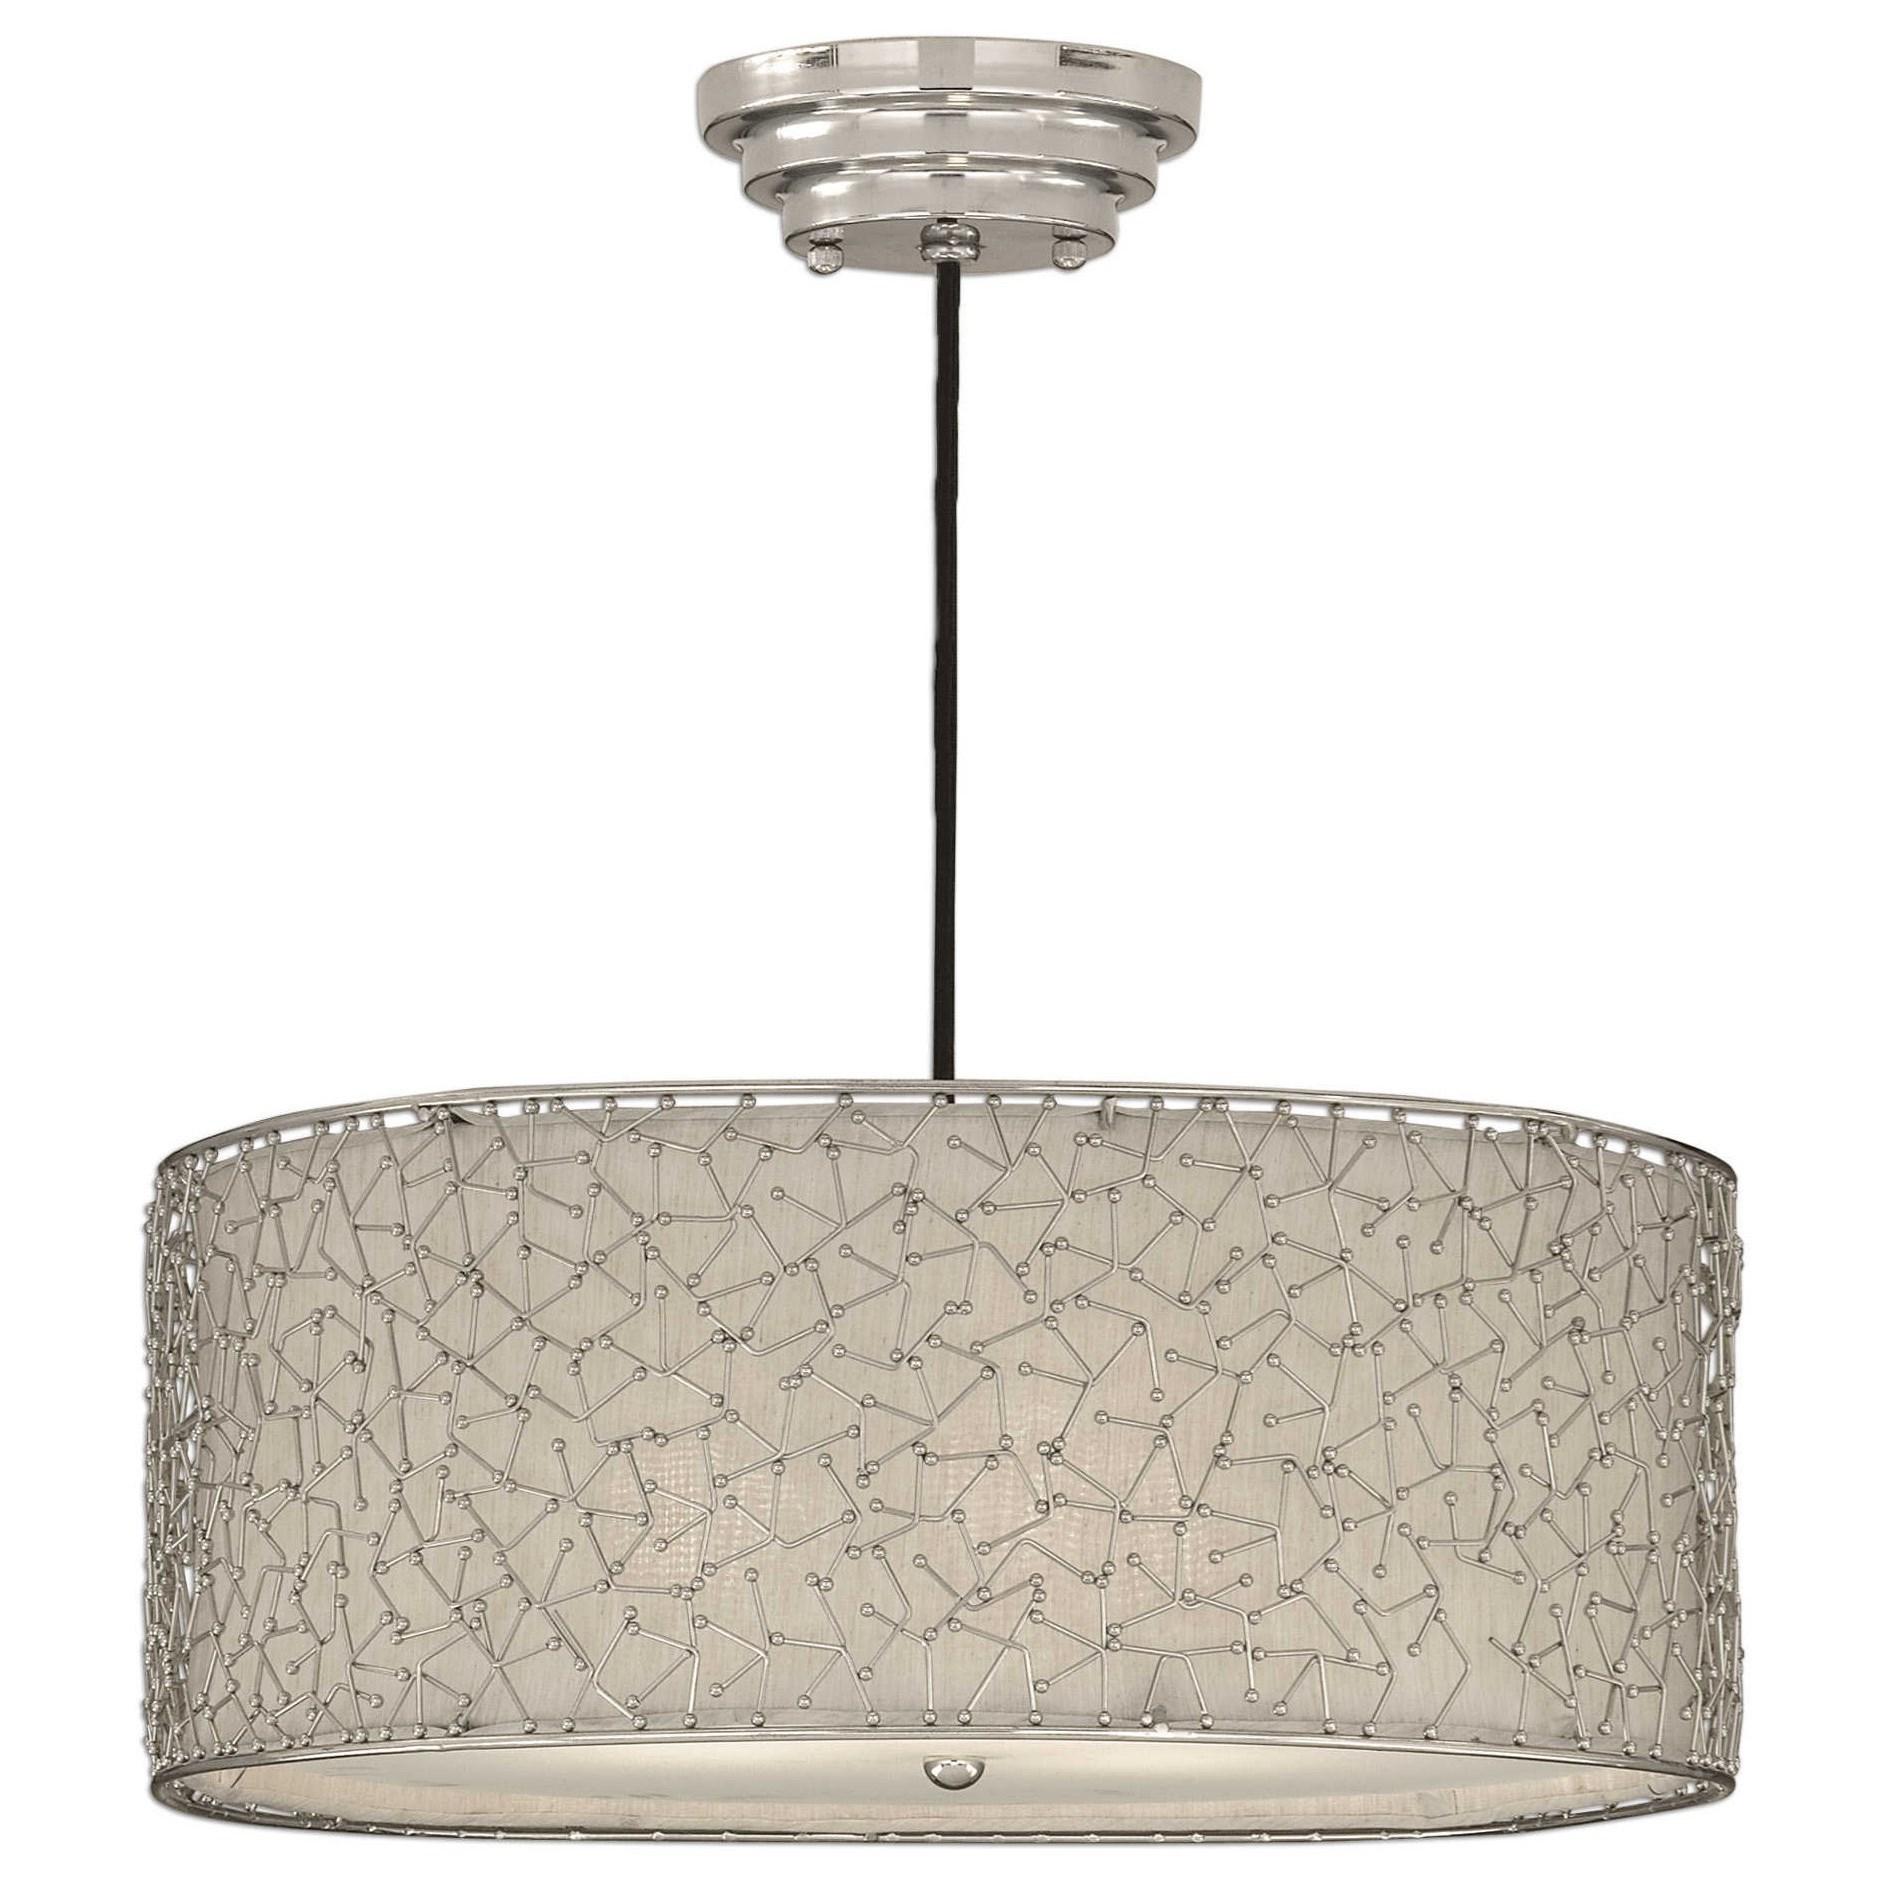 Lighting Fixtures - Pendant Lights Brandon Silver 3 Light Hanging Shade by Uttermost at Mueller Furniture